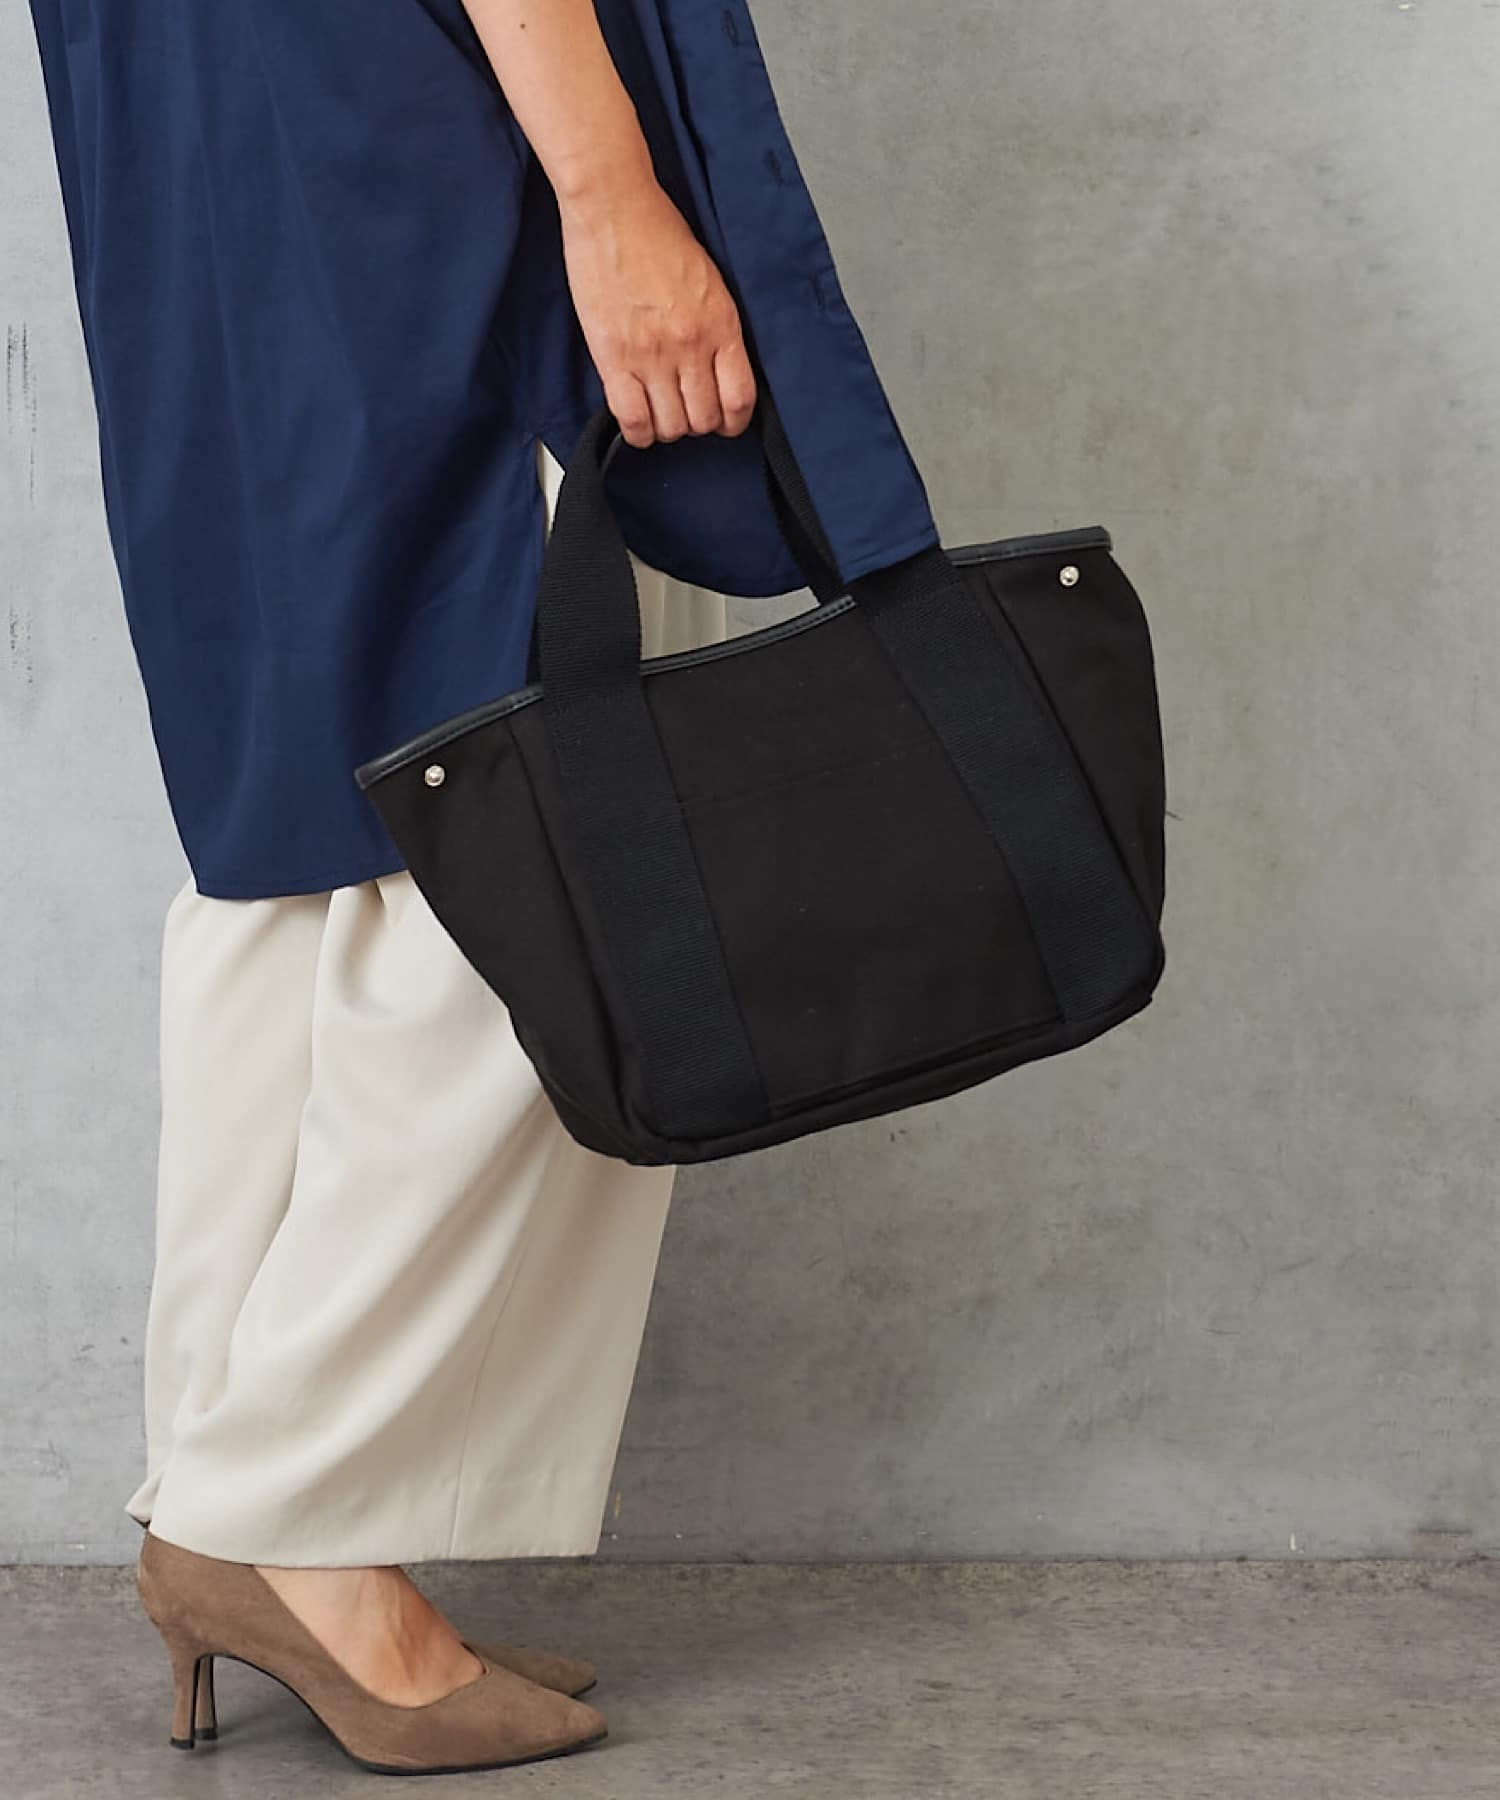 Pal collection(パルコレクション) 《新色追加!ポケット10個》キャンバストートバッグ